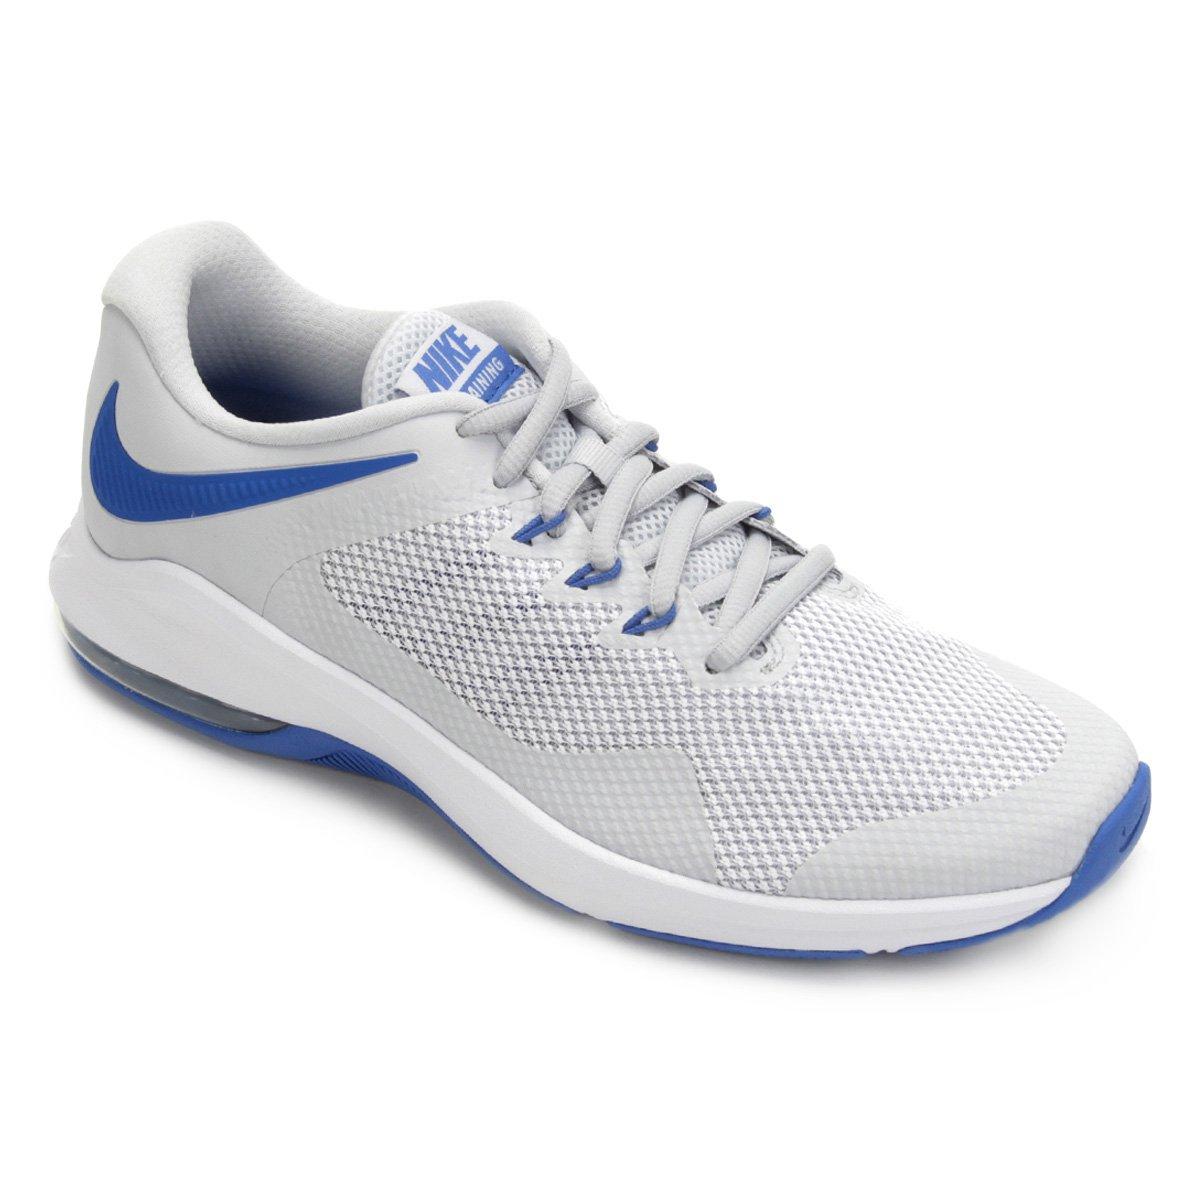 83c524560 Tênis Nike Air Max Alpha Trainer Masculino - Prata e Azul - Compre Agora